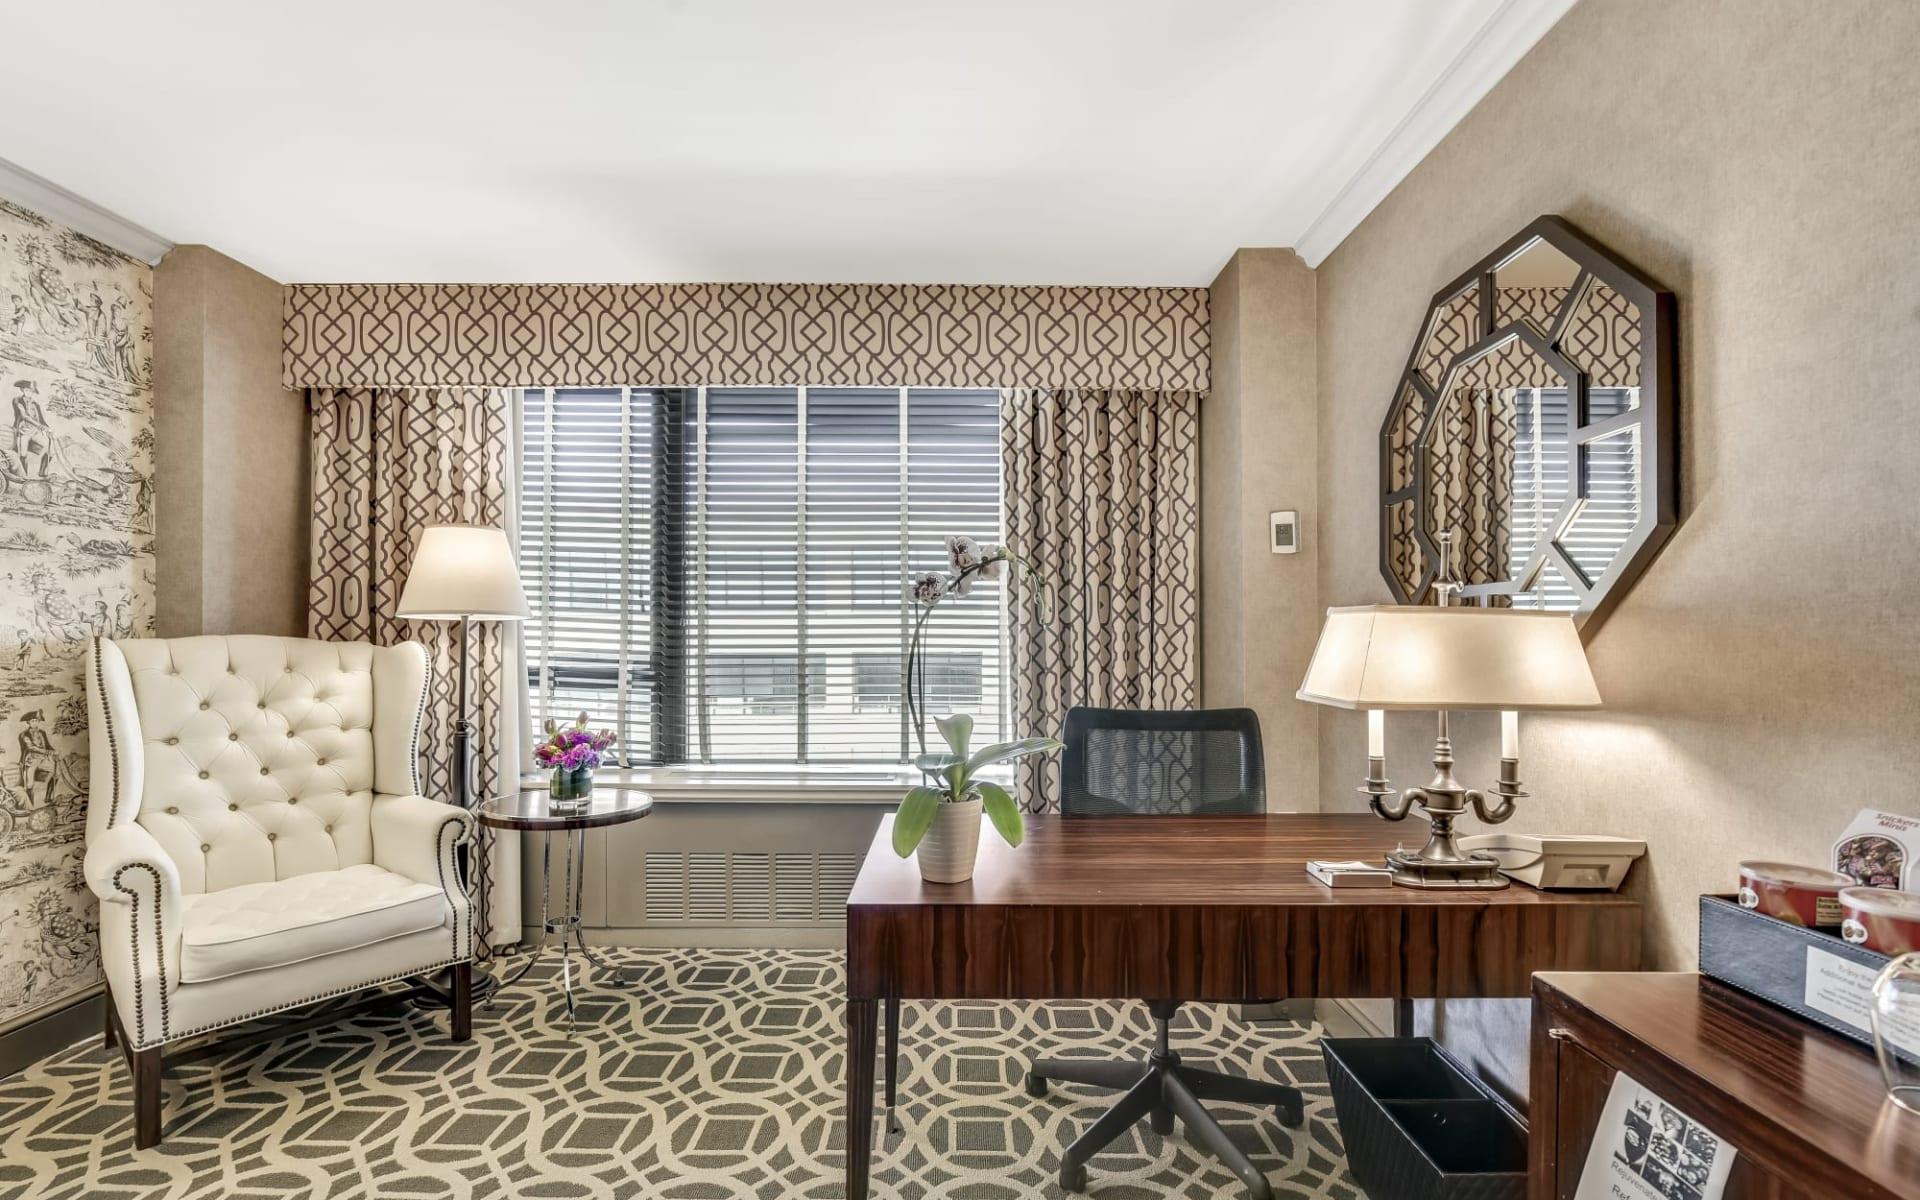 The Madison Washington DC a Hilton Hotel in Washington D.C.:  1 King View 5